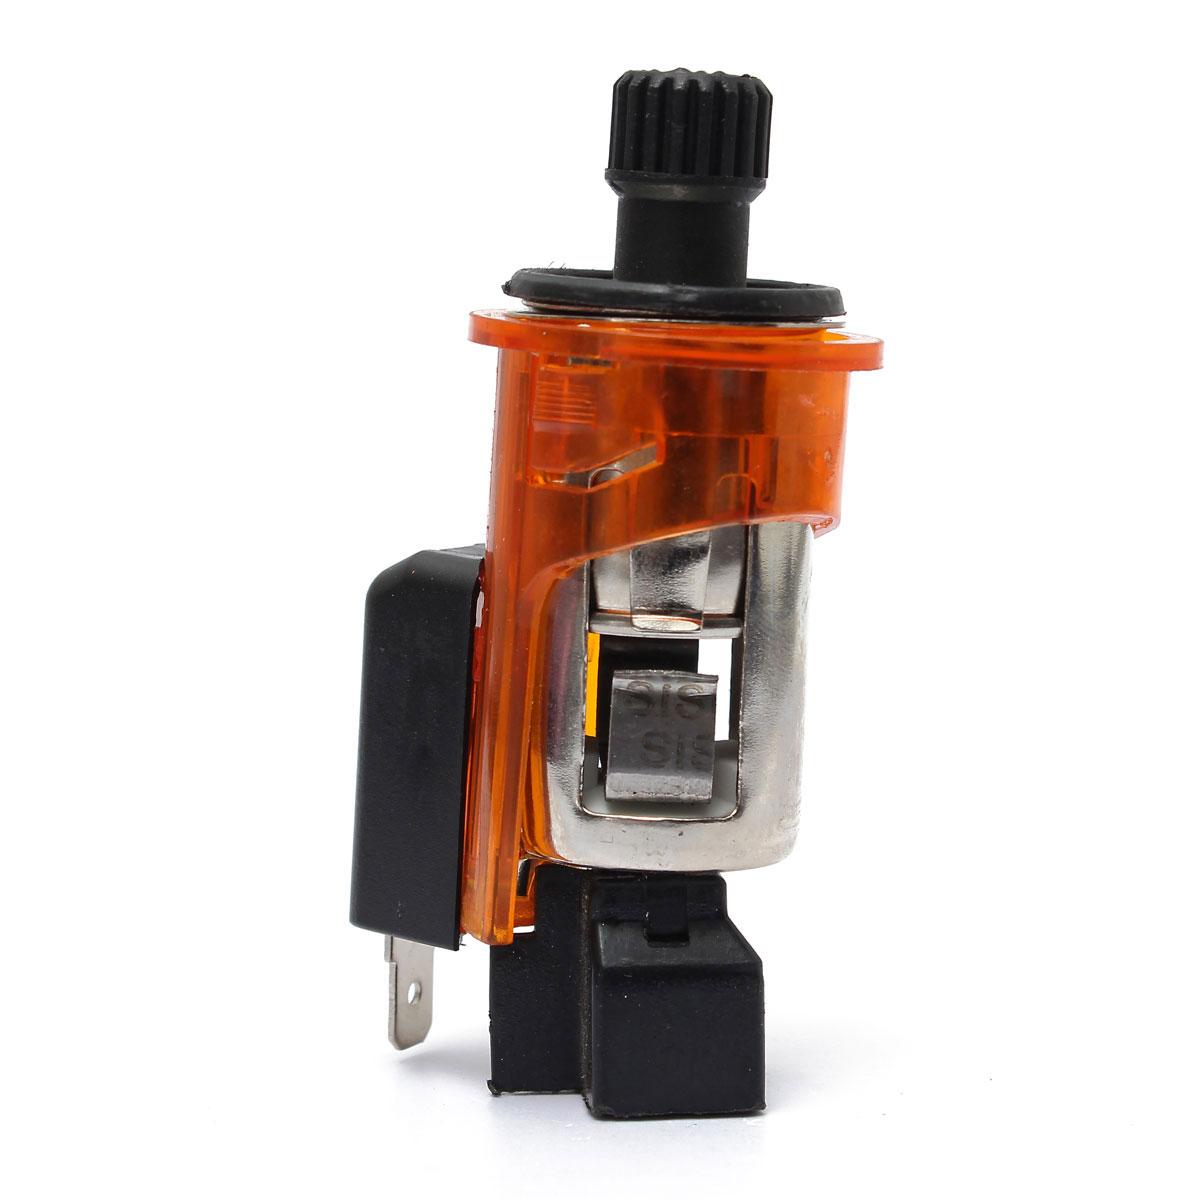 V Cigarette Lighter Plug Wiring Pictures To Pin On Pinterest - 12v cigarette lighter wiring diagram